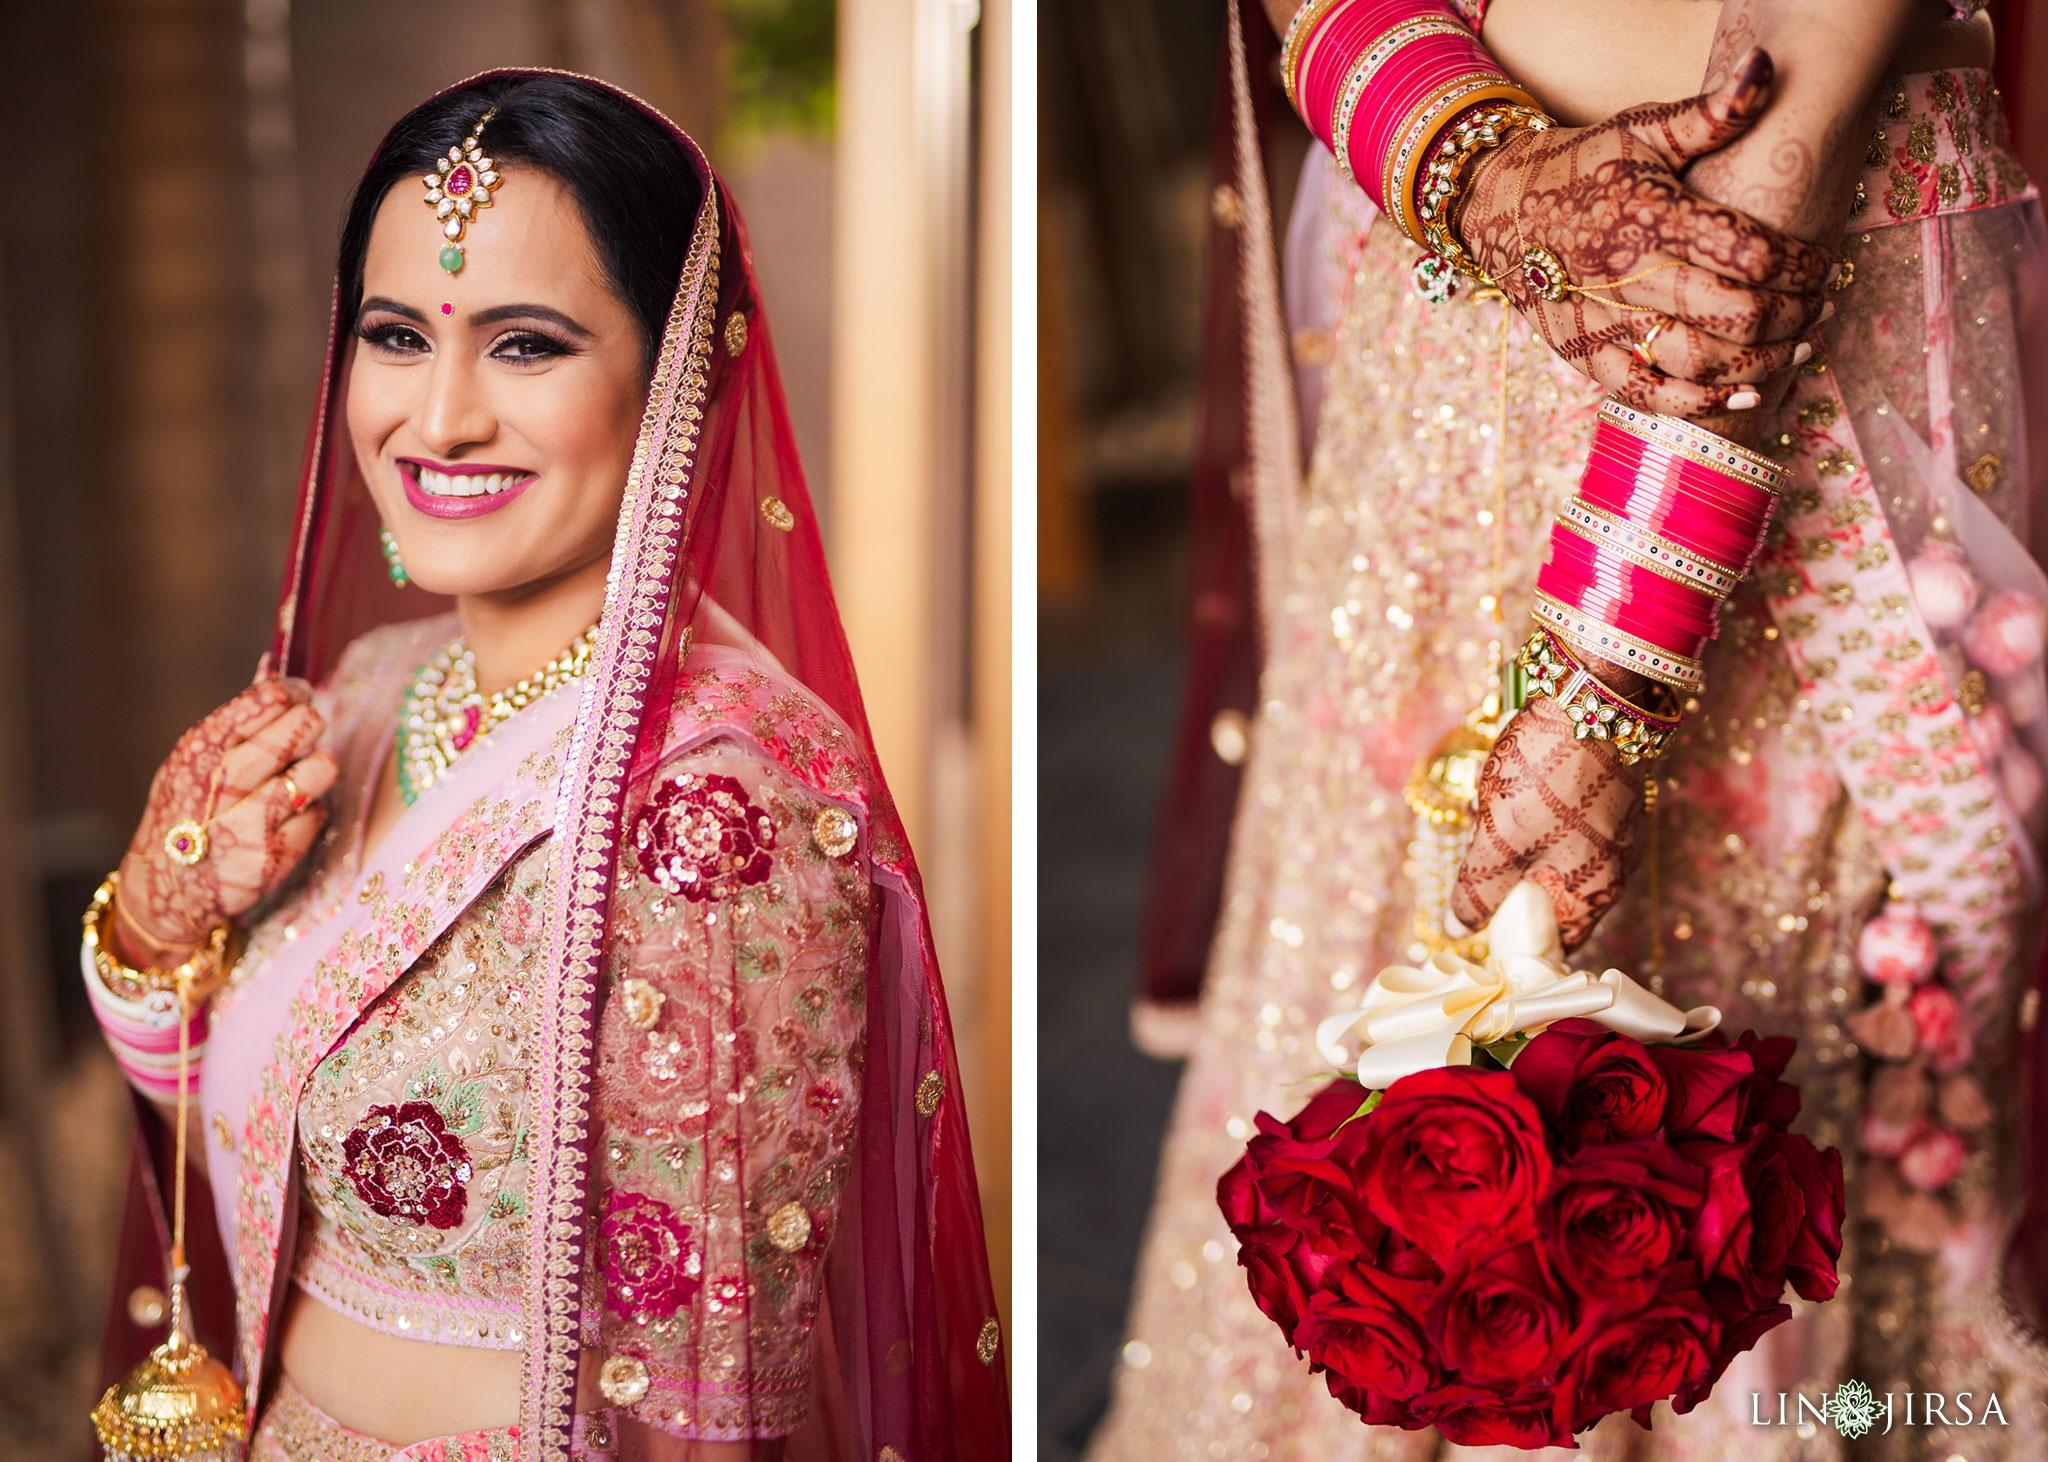 07 marina del rey marriott indian bride wedding photography